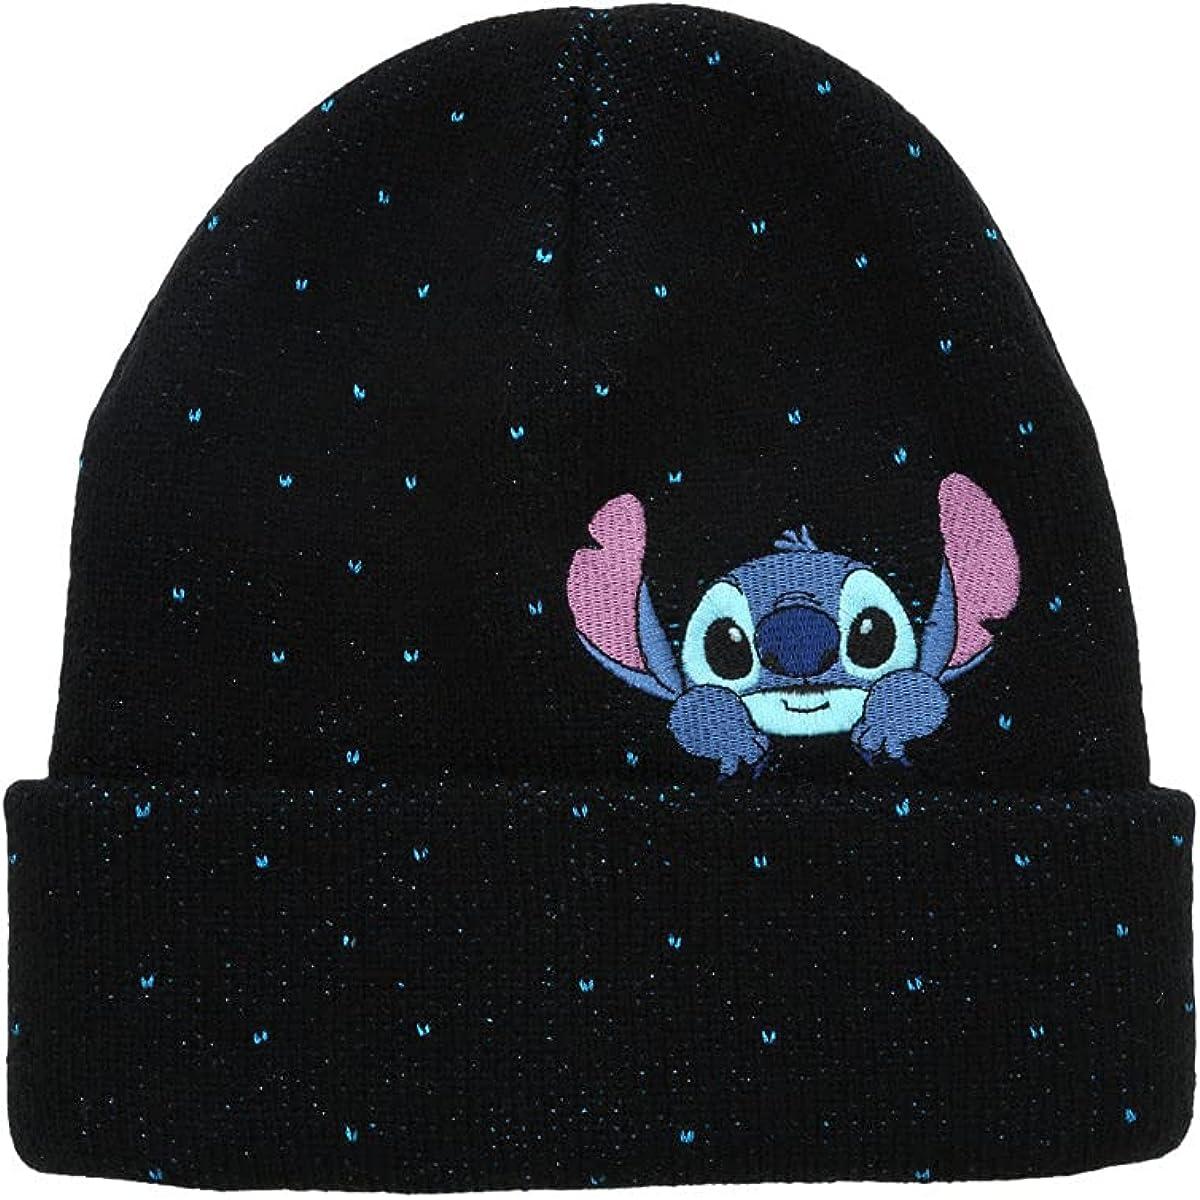 Disney Lilo & Stitch Glitter Stitch Peeking Beanie Multi One Size